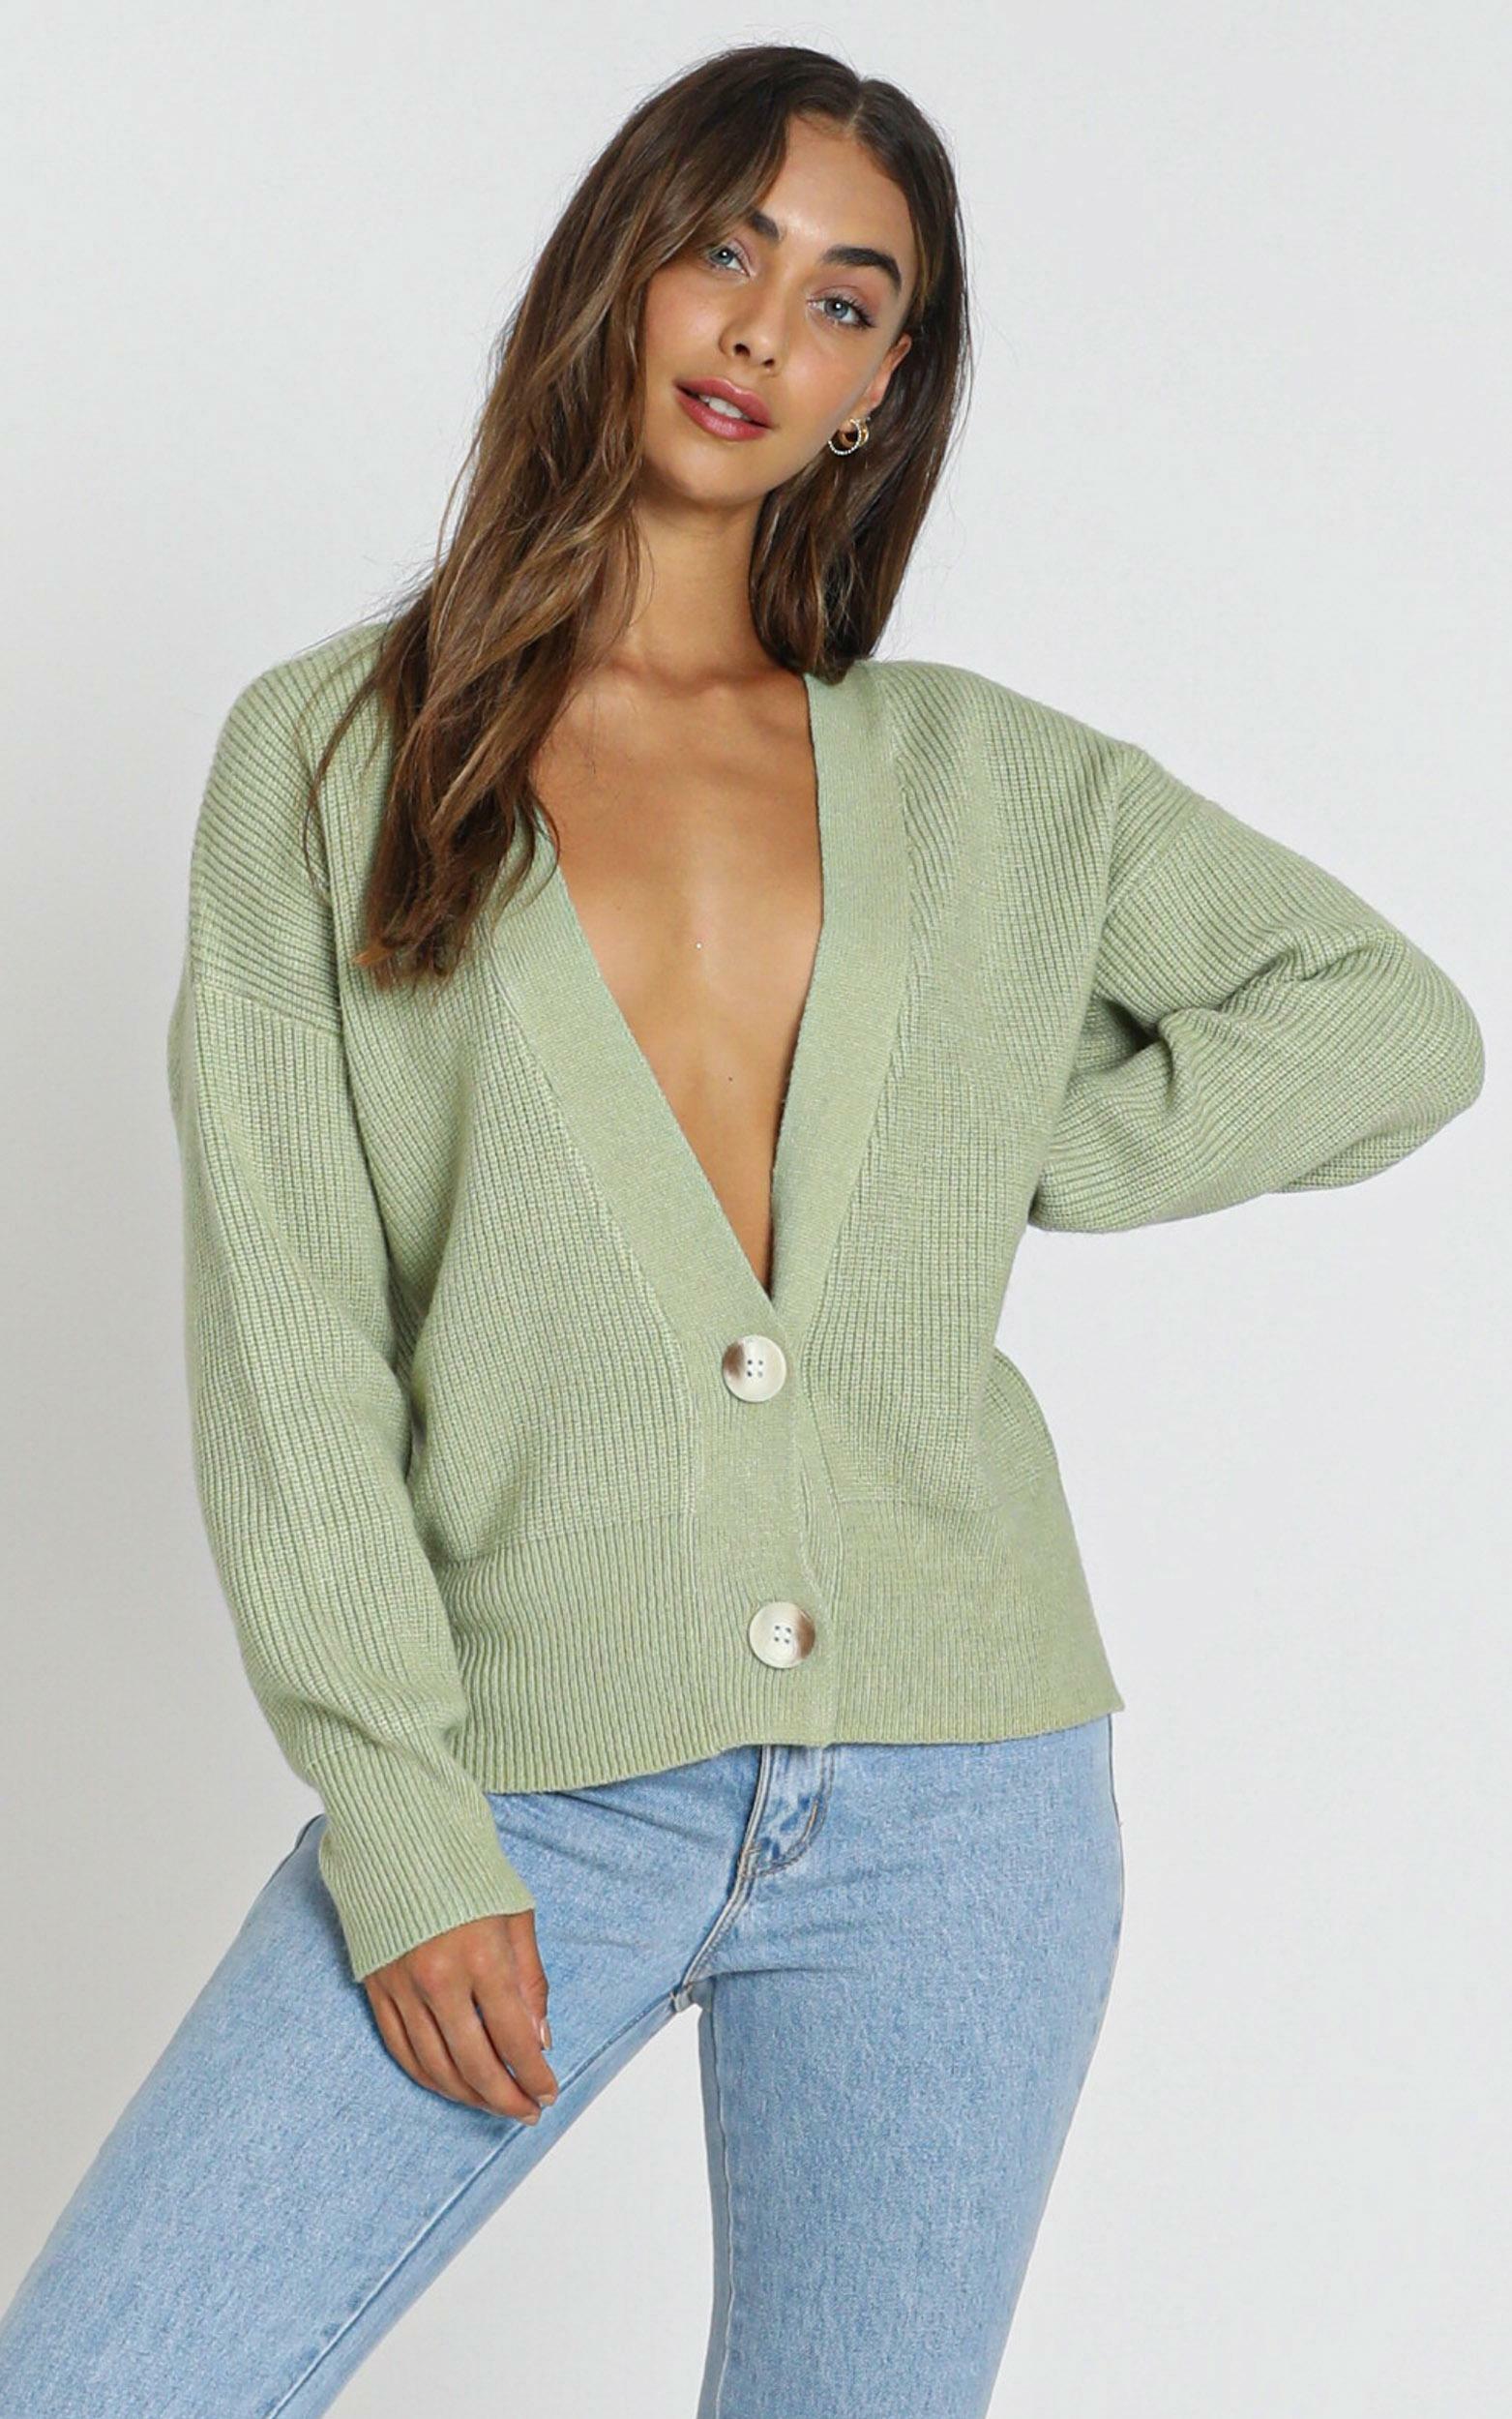 Original Trendsetter Knit Cardigan in Pistachio - S/M, Green, hi-res image number null